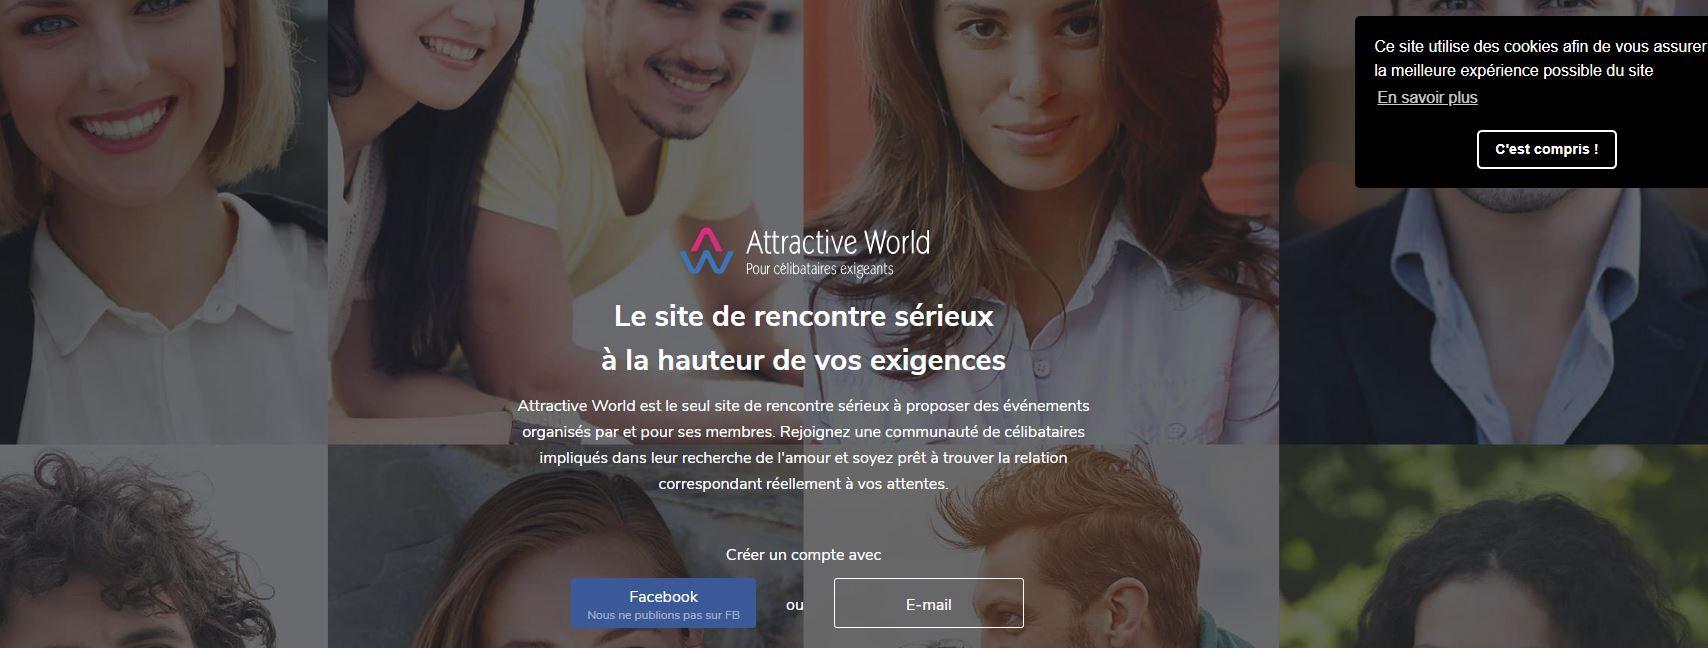 site de rencontres attractive world